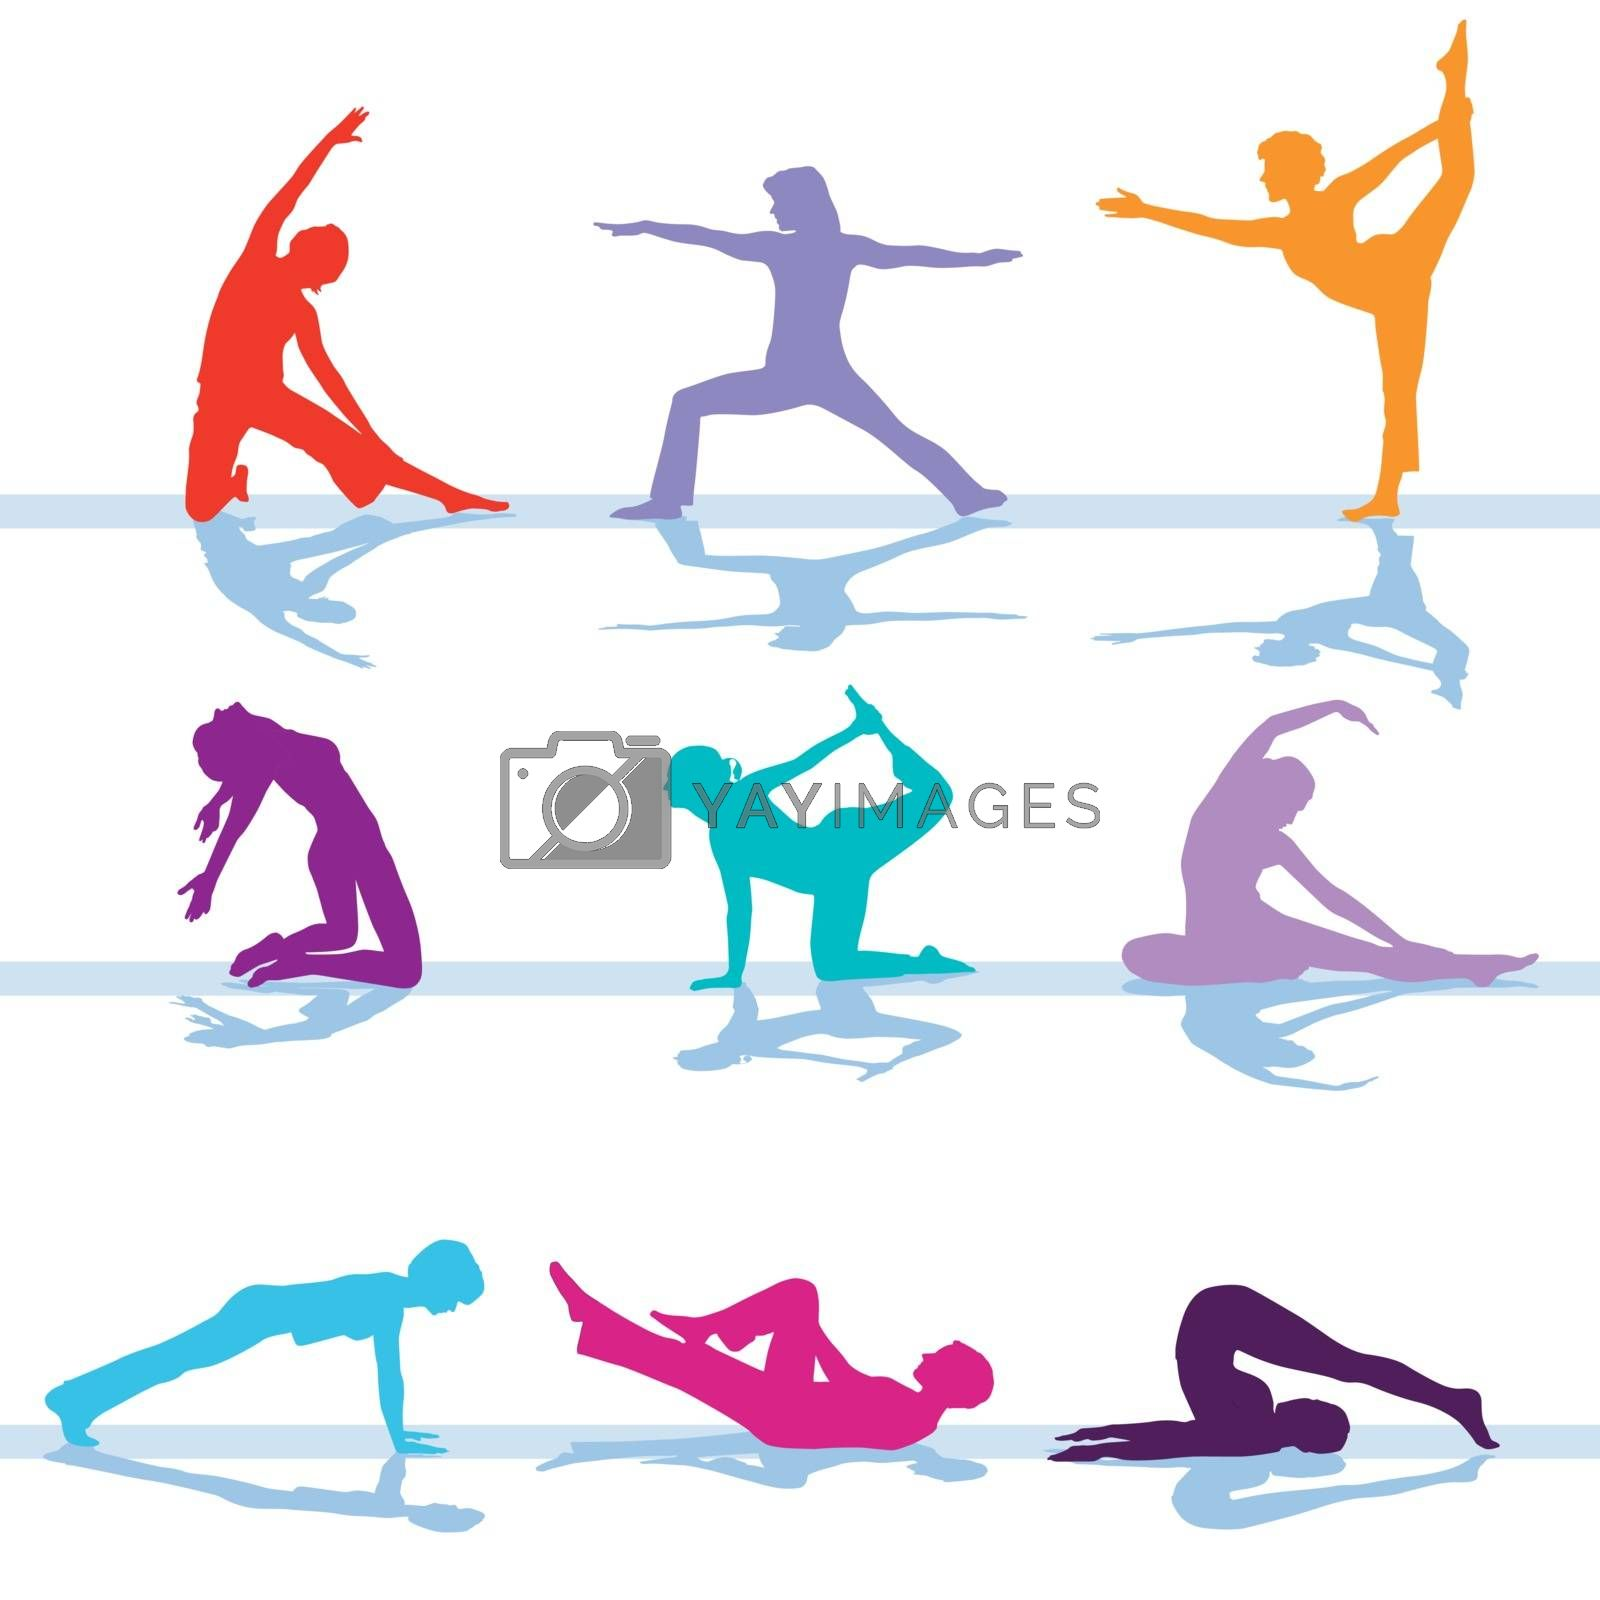 Gym fitness workout illustration